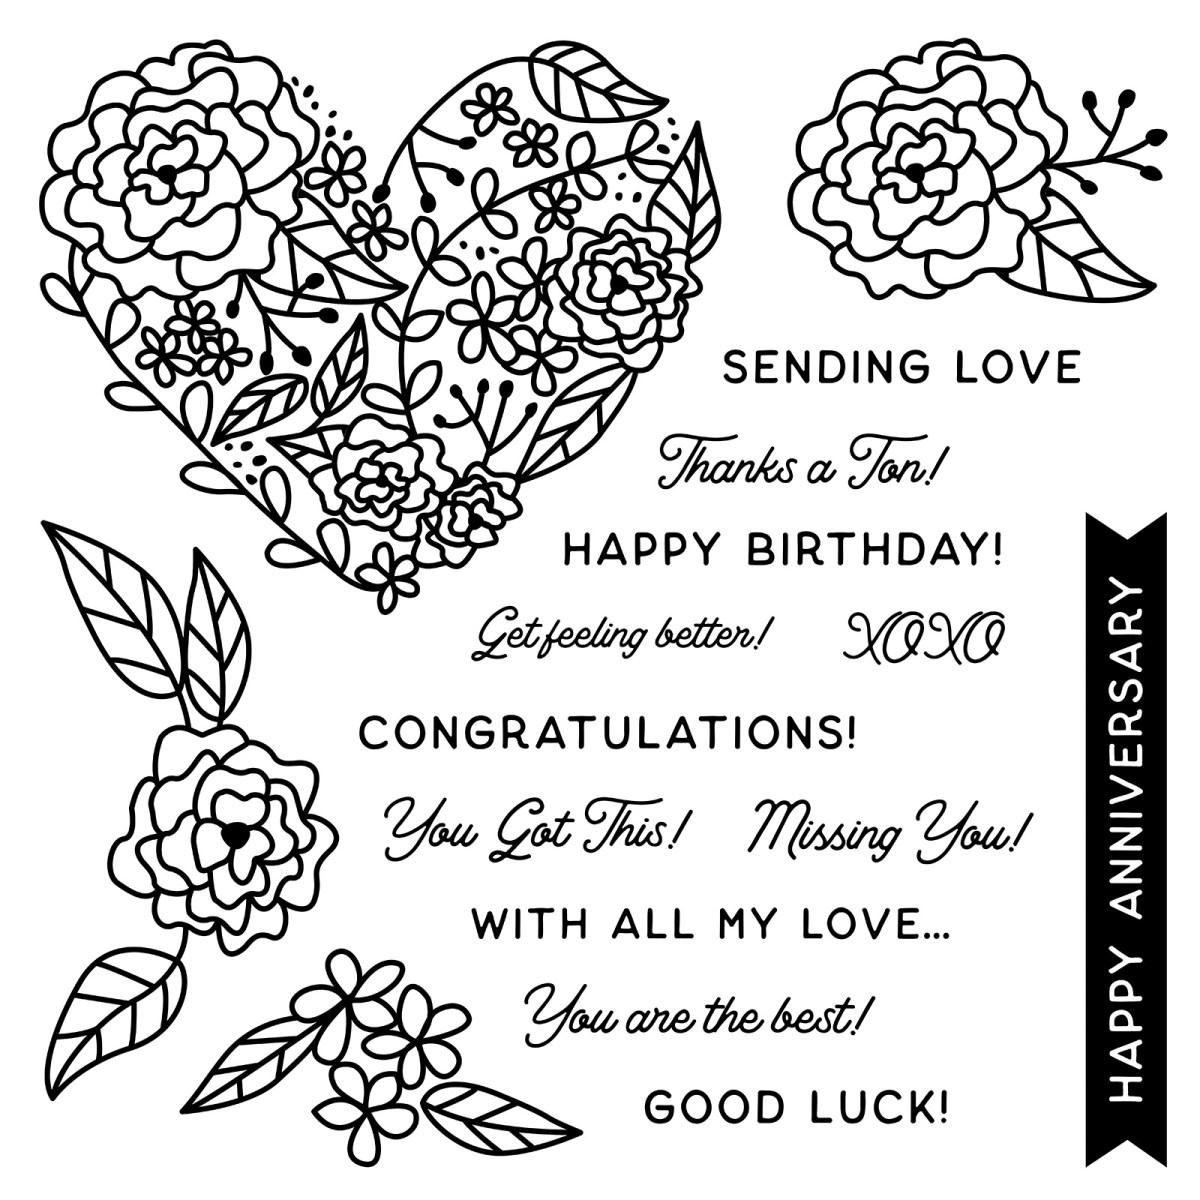 Close To My Heart VIP #ctmh #closetomyheart #ctmhvip #closetomyheartvip #sotm #stampofthemonth #withallmylove #missingyou #happyanniversary #congratulations #goodluck #happybirthday #feelbetter #xoxo #ctmhmakers #cardmaking